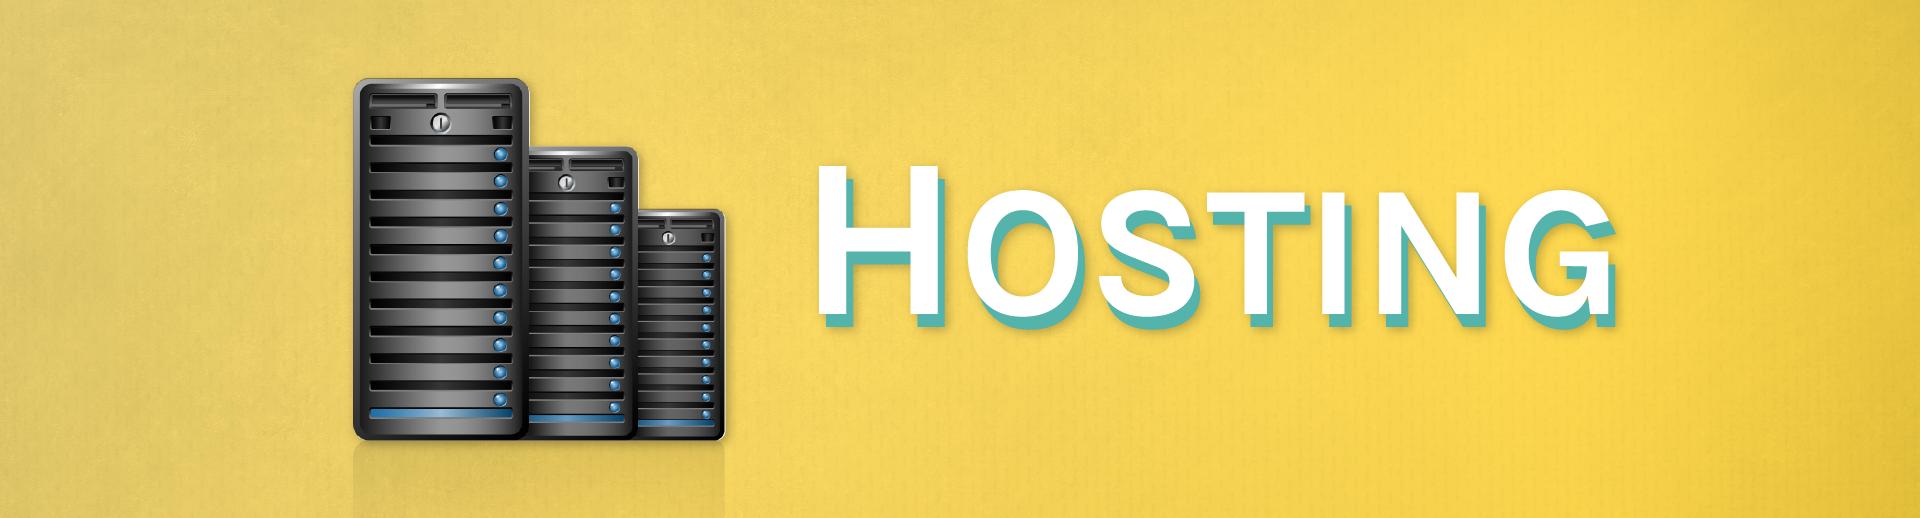 Hosting_thumbnail